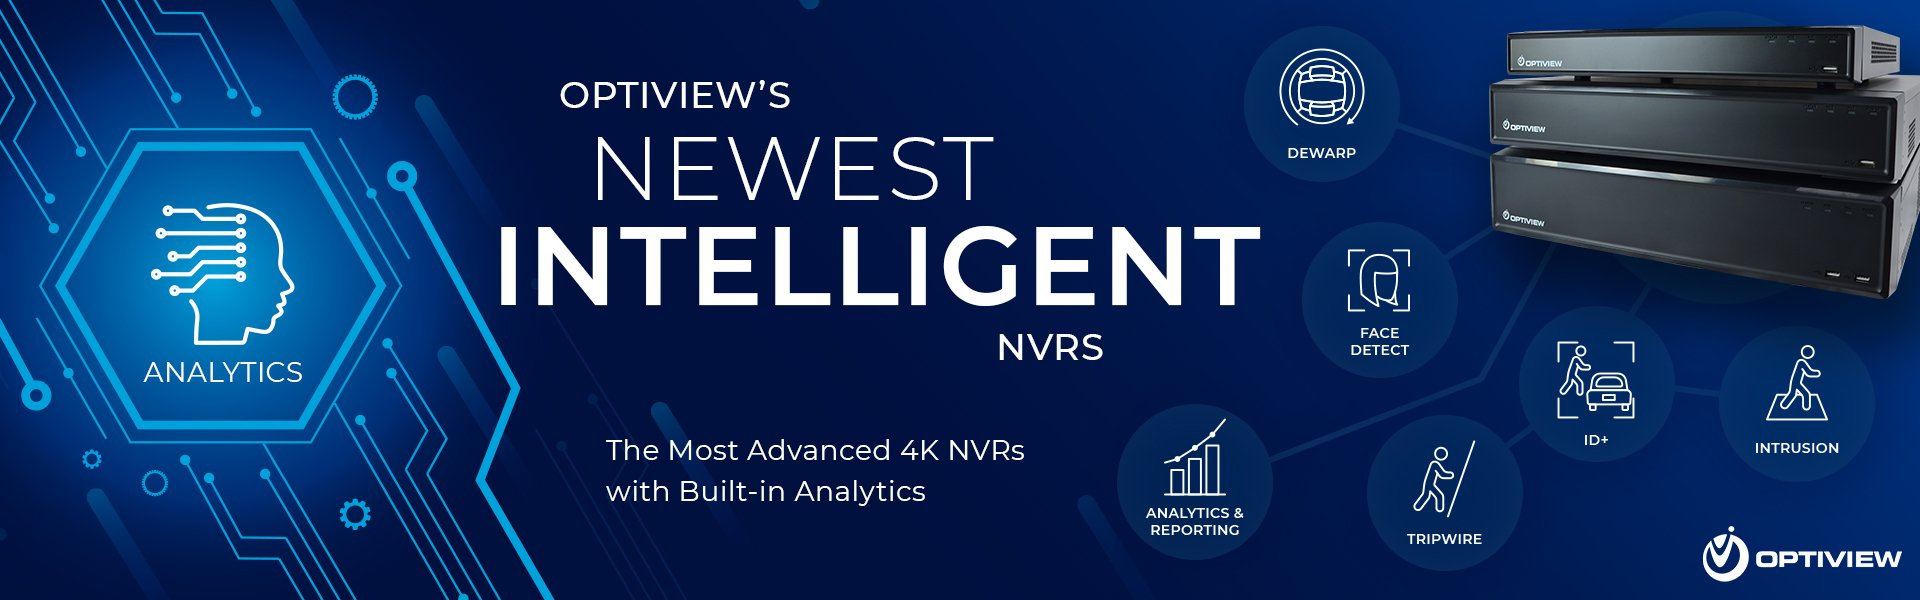 Intelligent NVR from Optiview with Analytics and Fisheye Dewarp